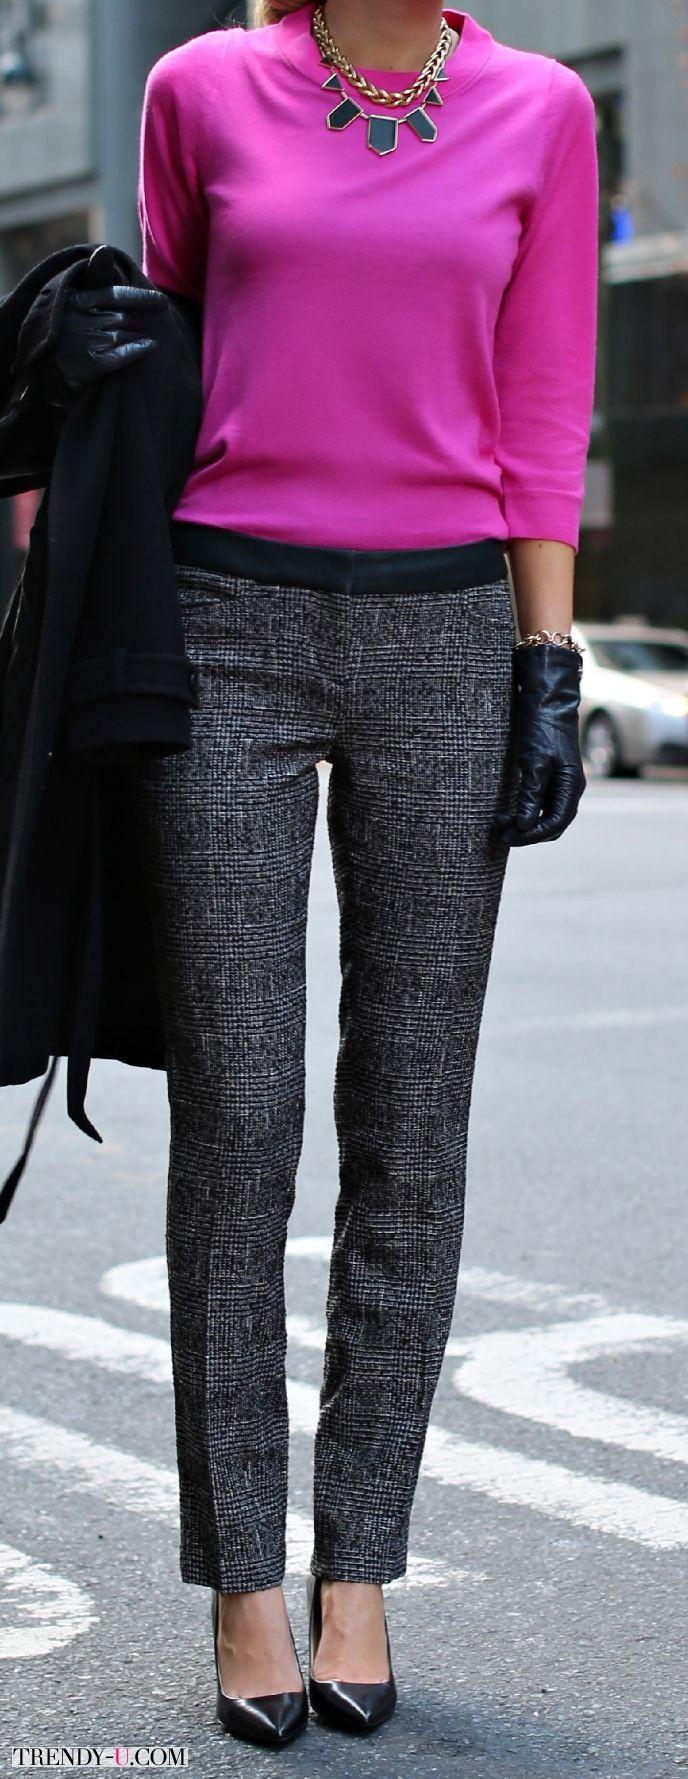 Элегантные брюки из твида